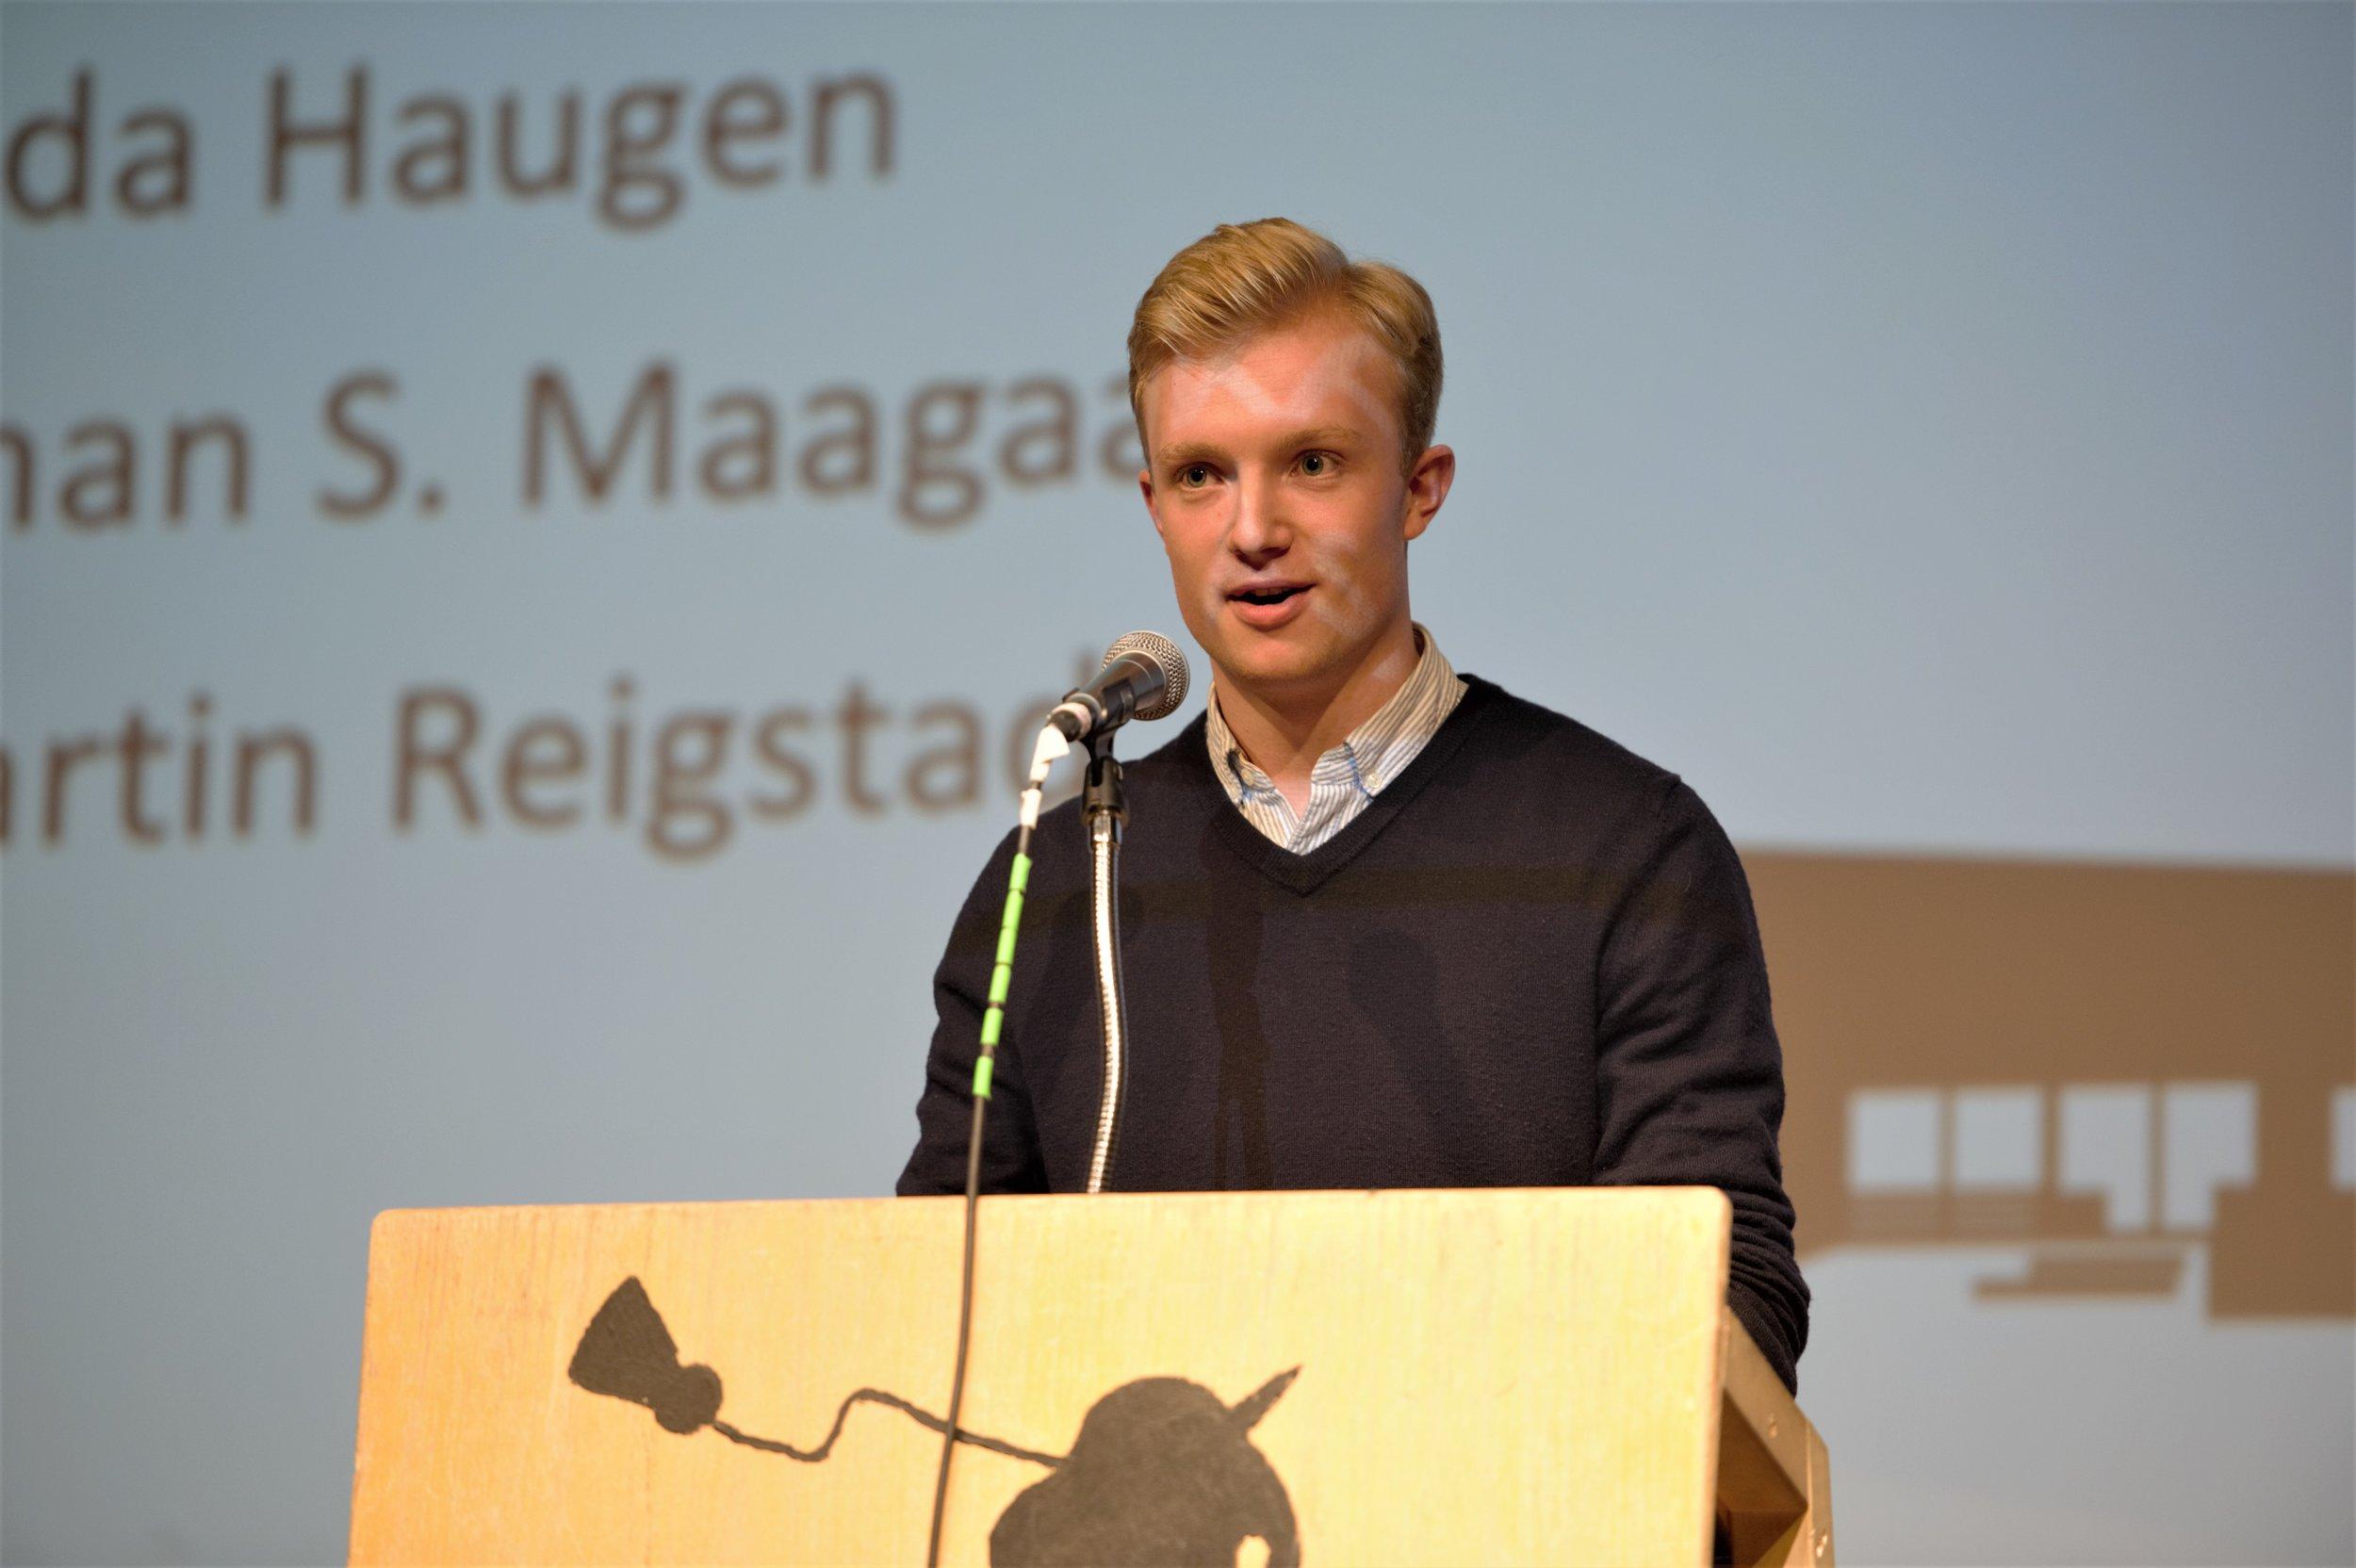 Johan Stener Maagaard.jpg